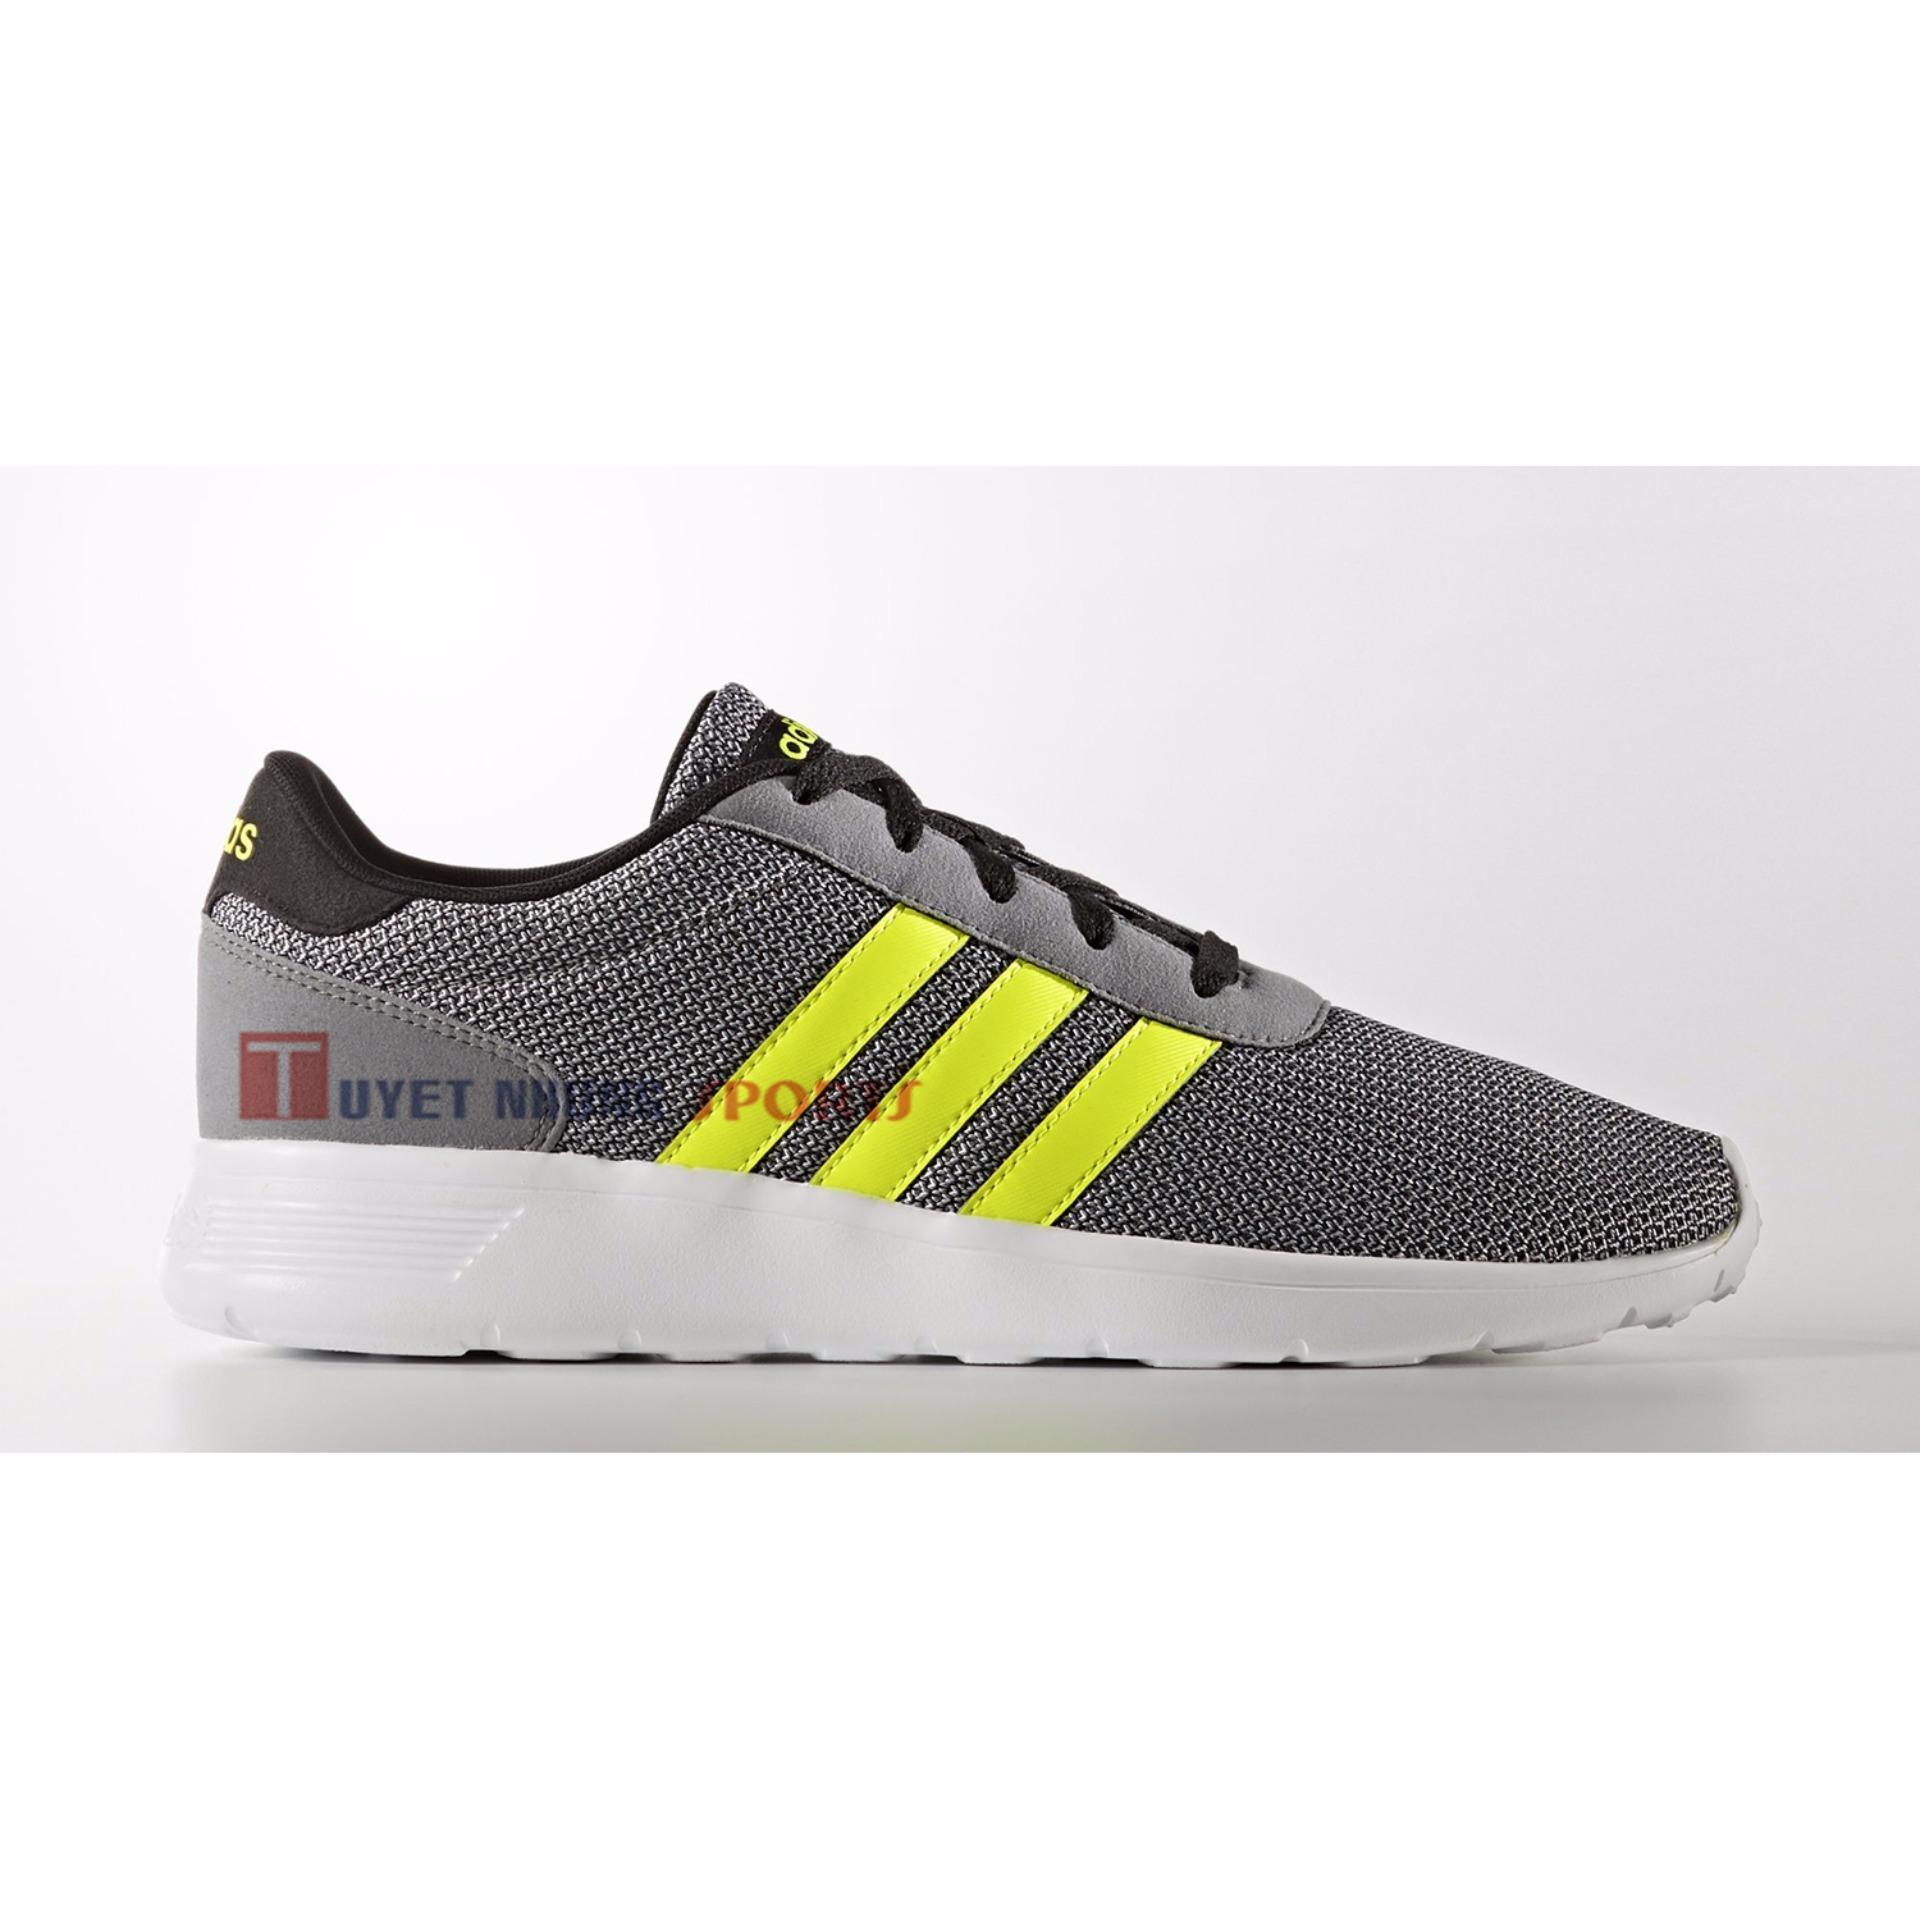 762a299595eb0 ... sweden giày th thao nam adidas neo lite racer aw3871 2b3f8 b60bc